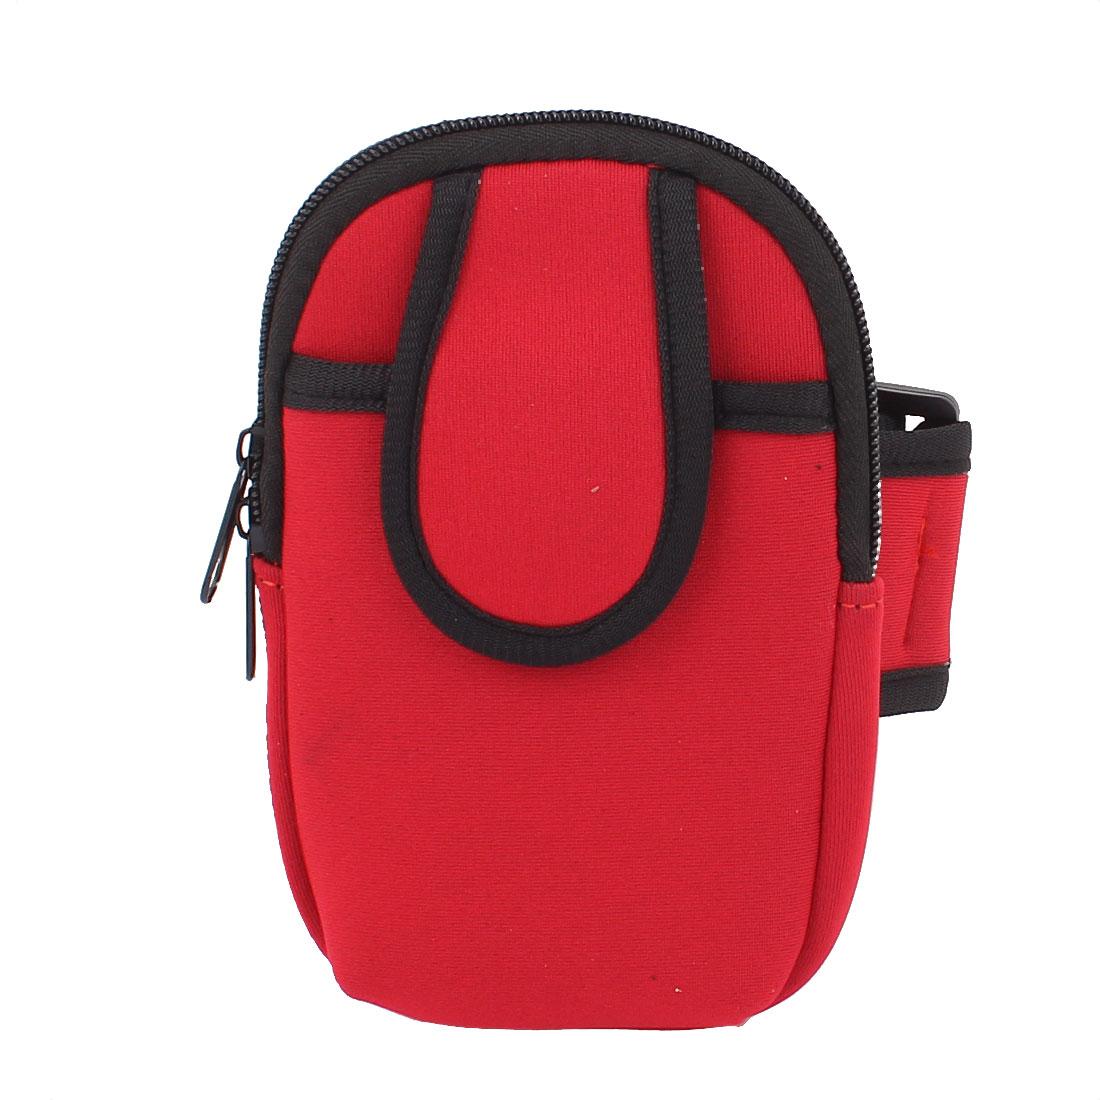 Outdoor Sport Zipper Closure Wrist Arm Pouch Cellphone Bag Package Holder Red